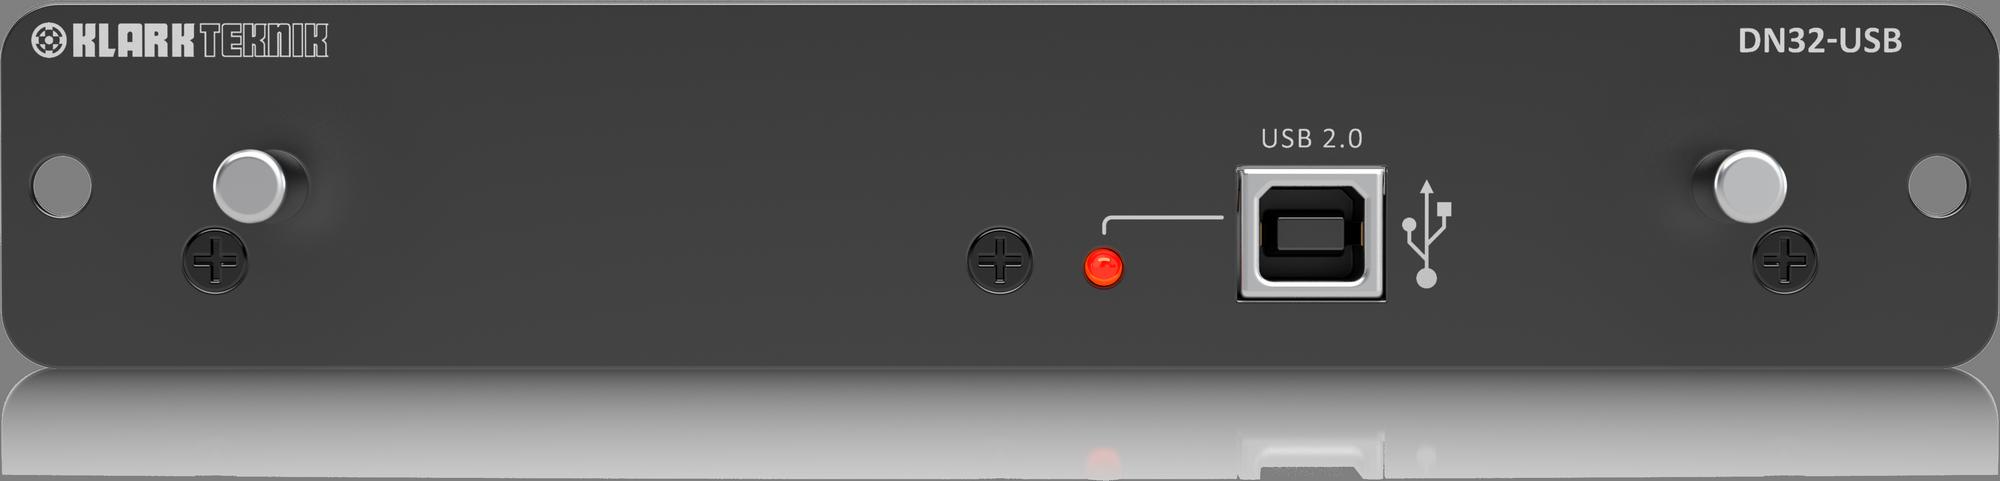 Klark Teknik DN32-USB - Expansion module